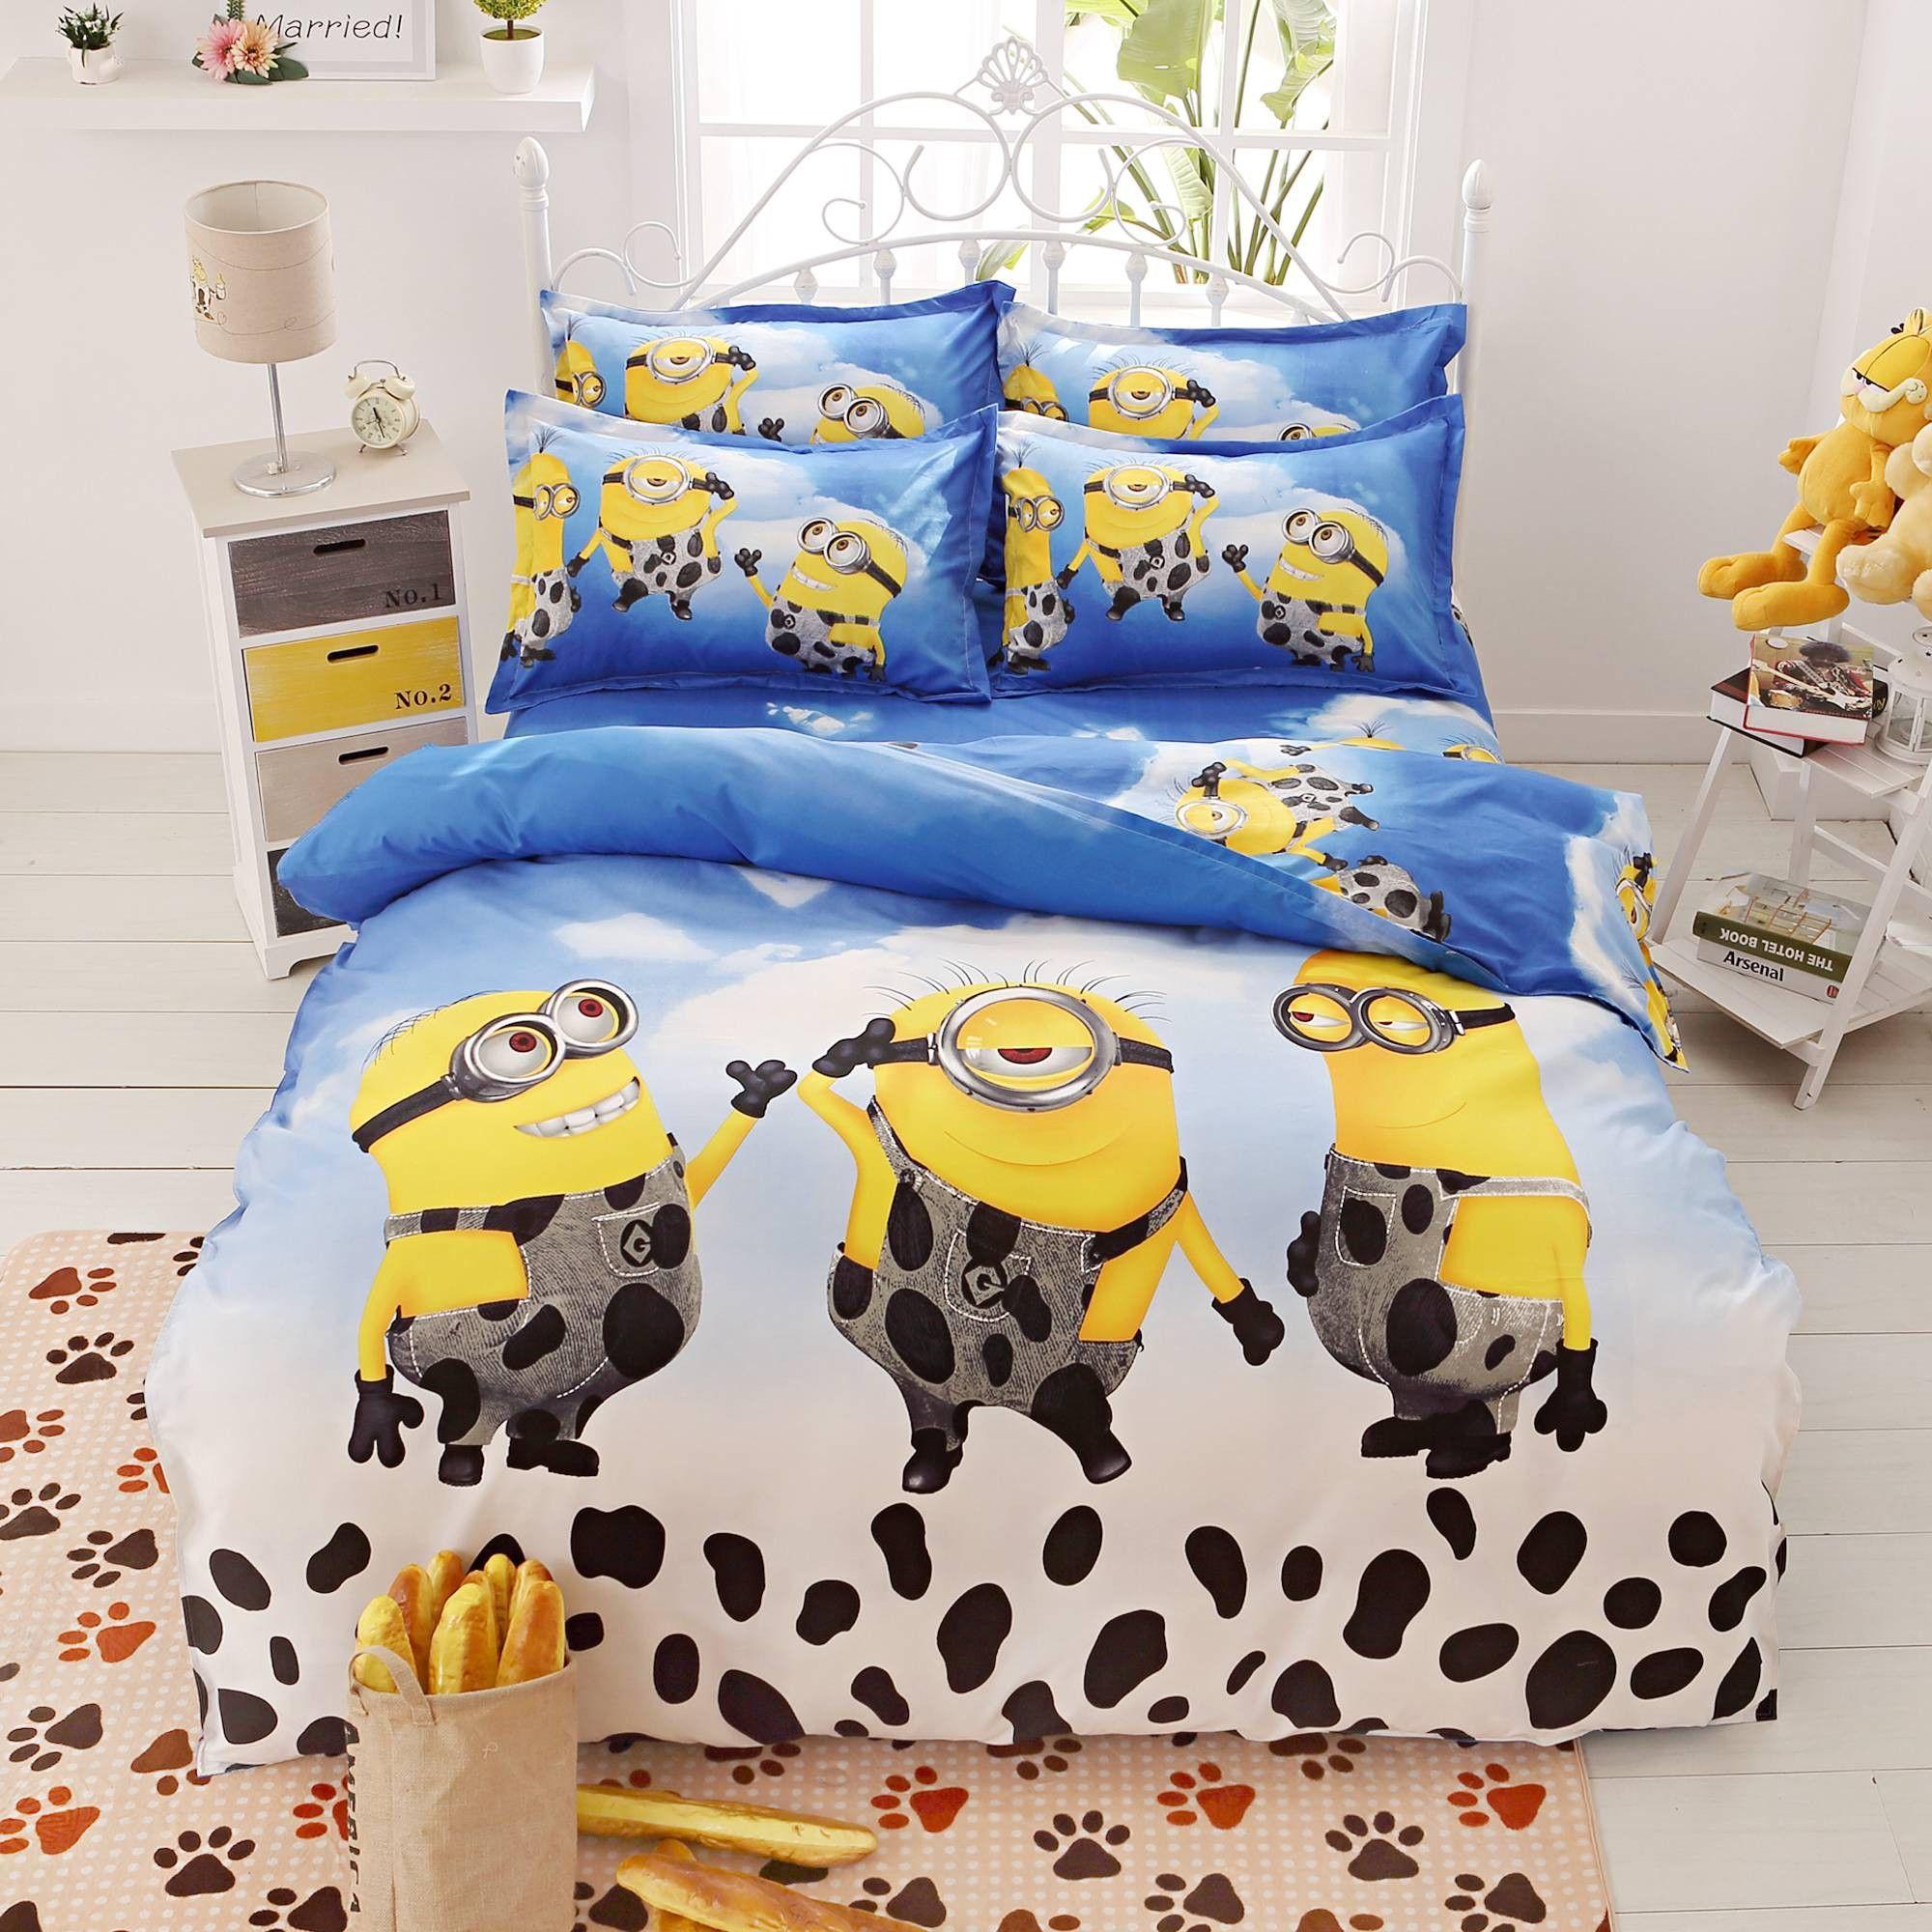 Hello kitty bedsheet blue - Home Textile Cartoon Children Kids Bedding Set Red Minions Hello Kitty Mickey Mouse Bed Linen Duvet